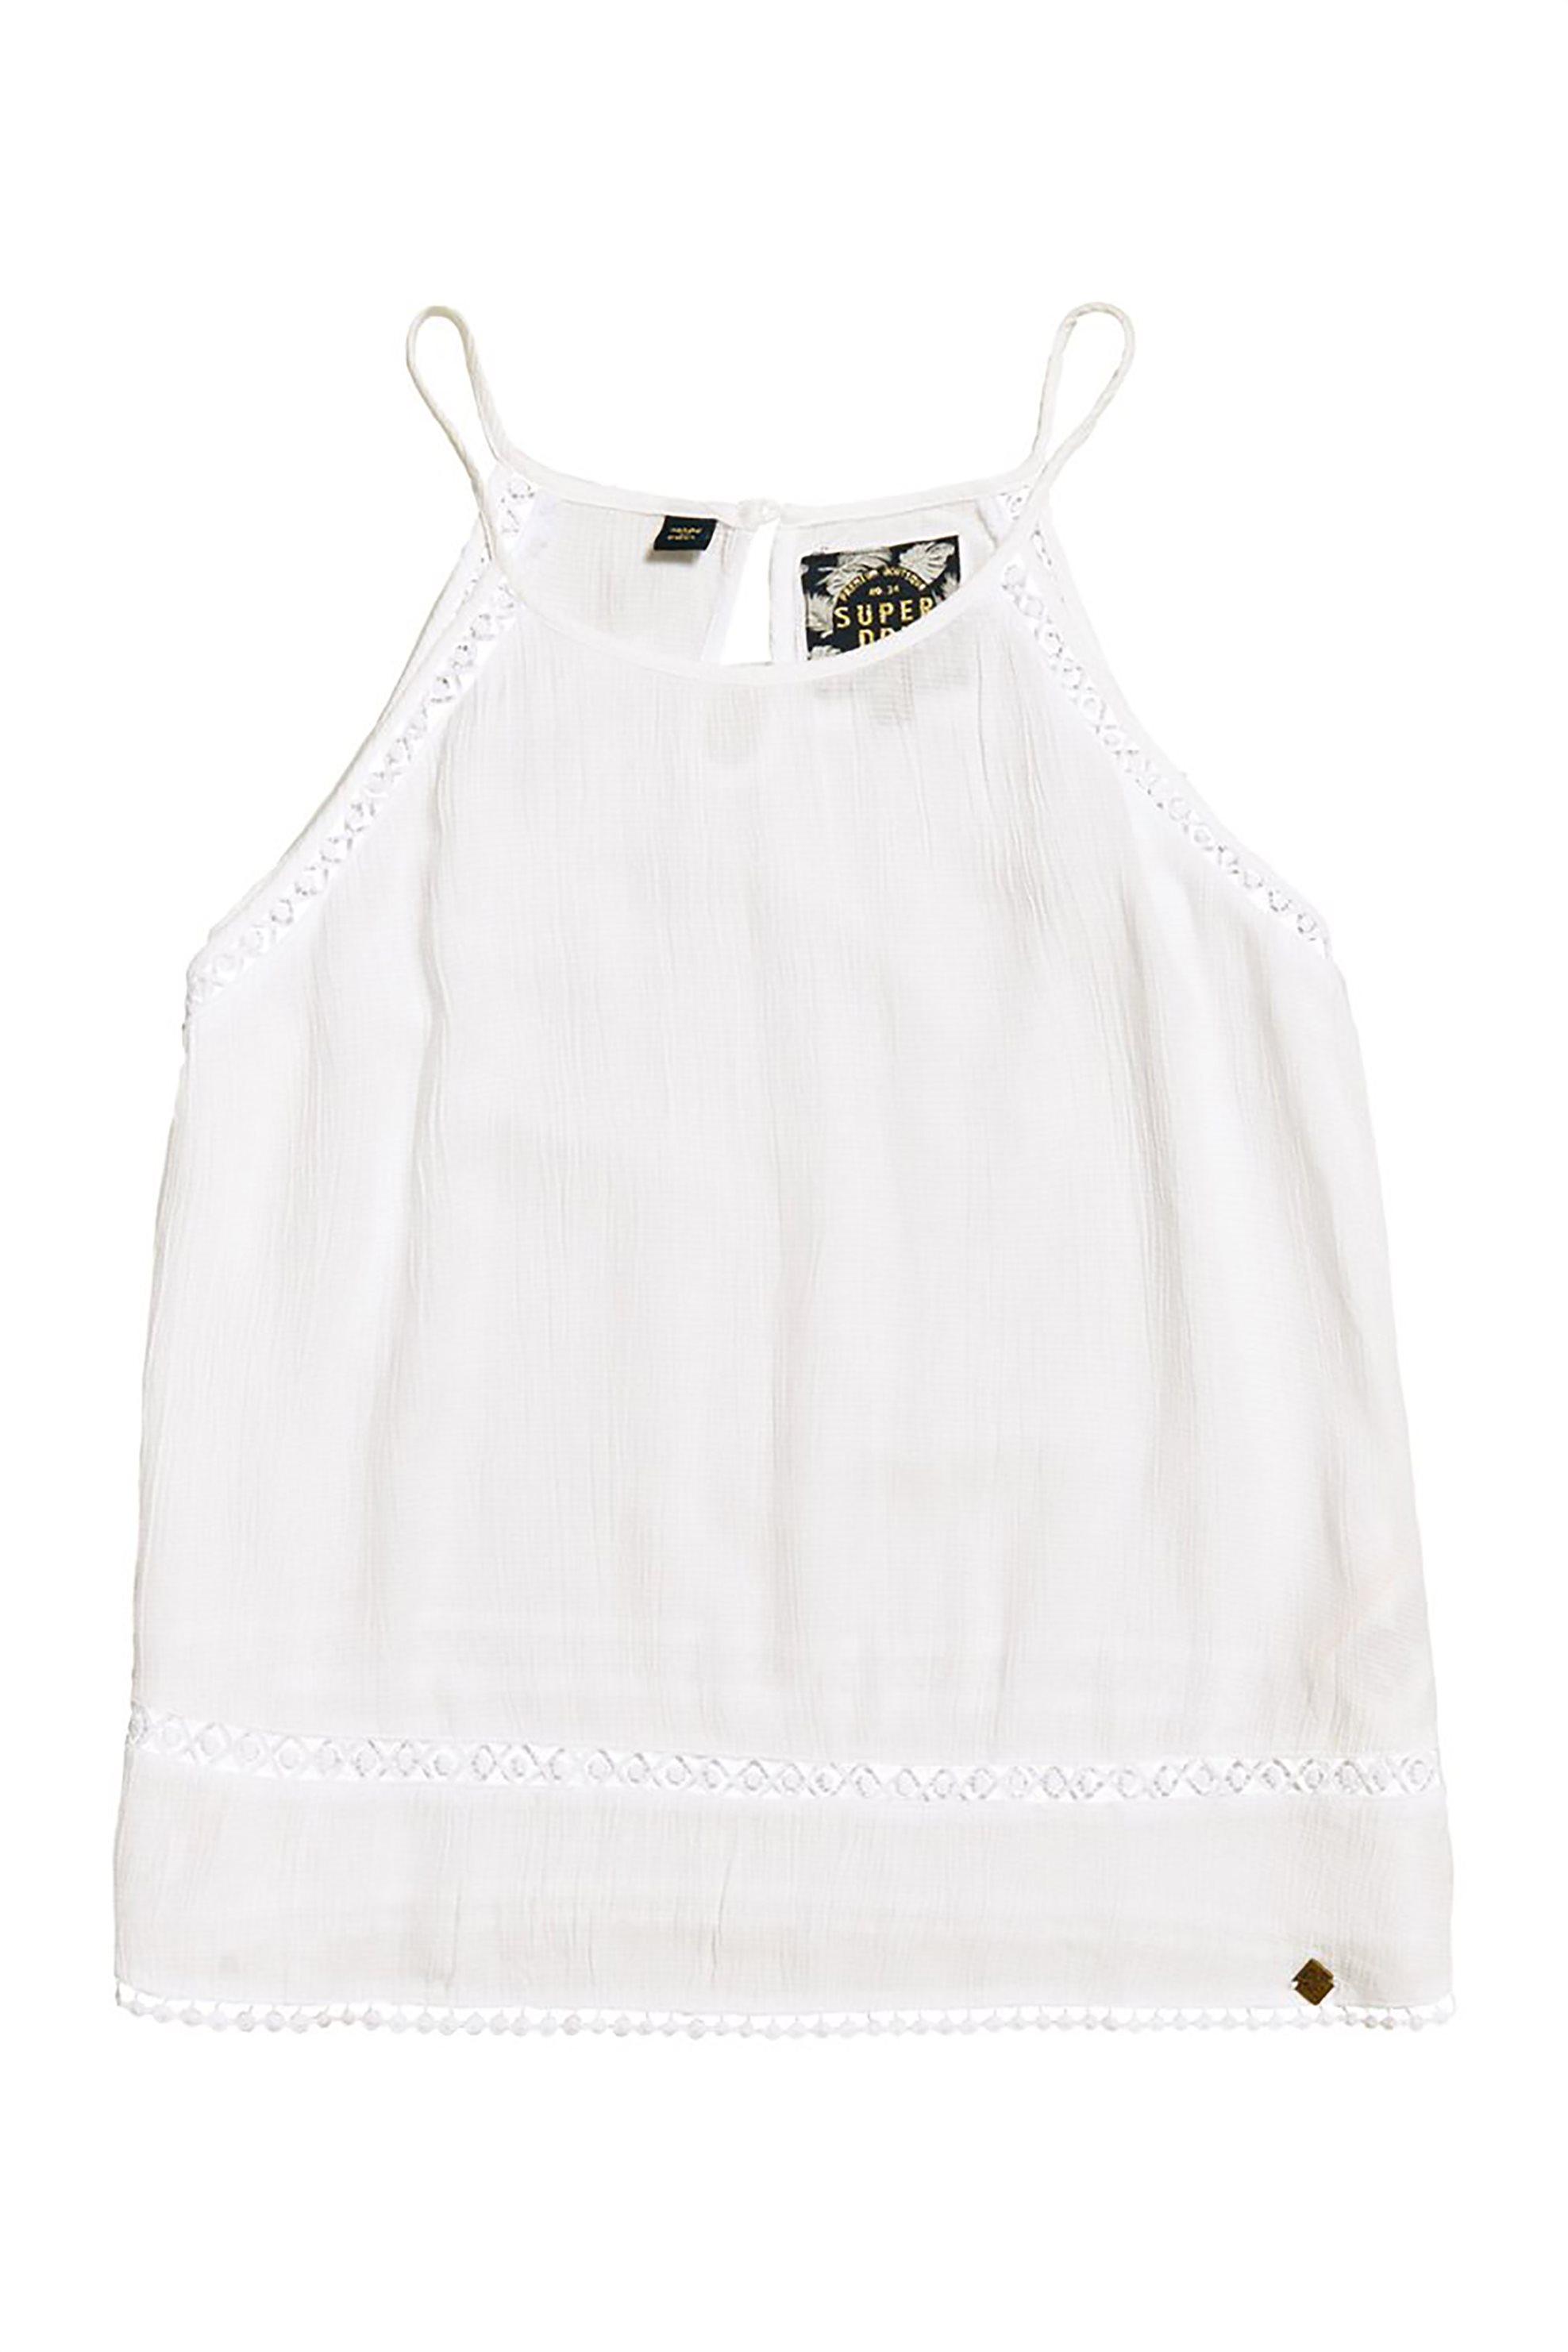 Superdry γυναικεία μπλούζα με λεπτό ραντάκι Ricky - G60101JT - Λευκό γυναικα   ρουχα   tops   ραντάκια   κορμάκια   μπλούζες   casual